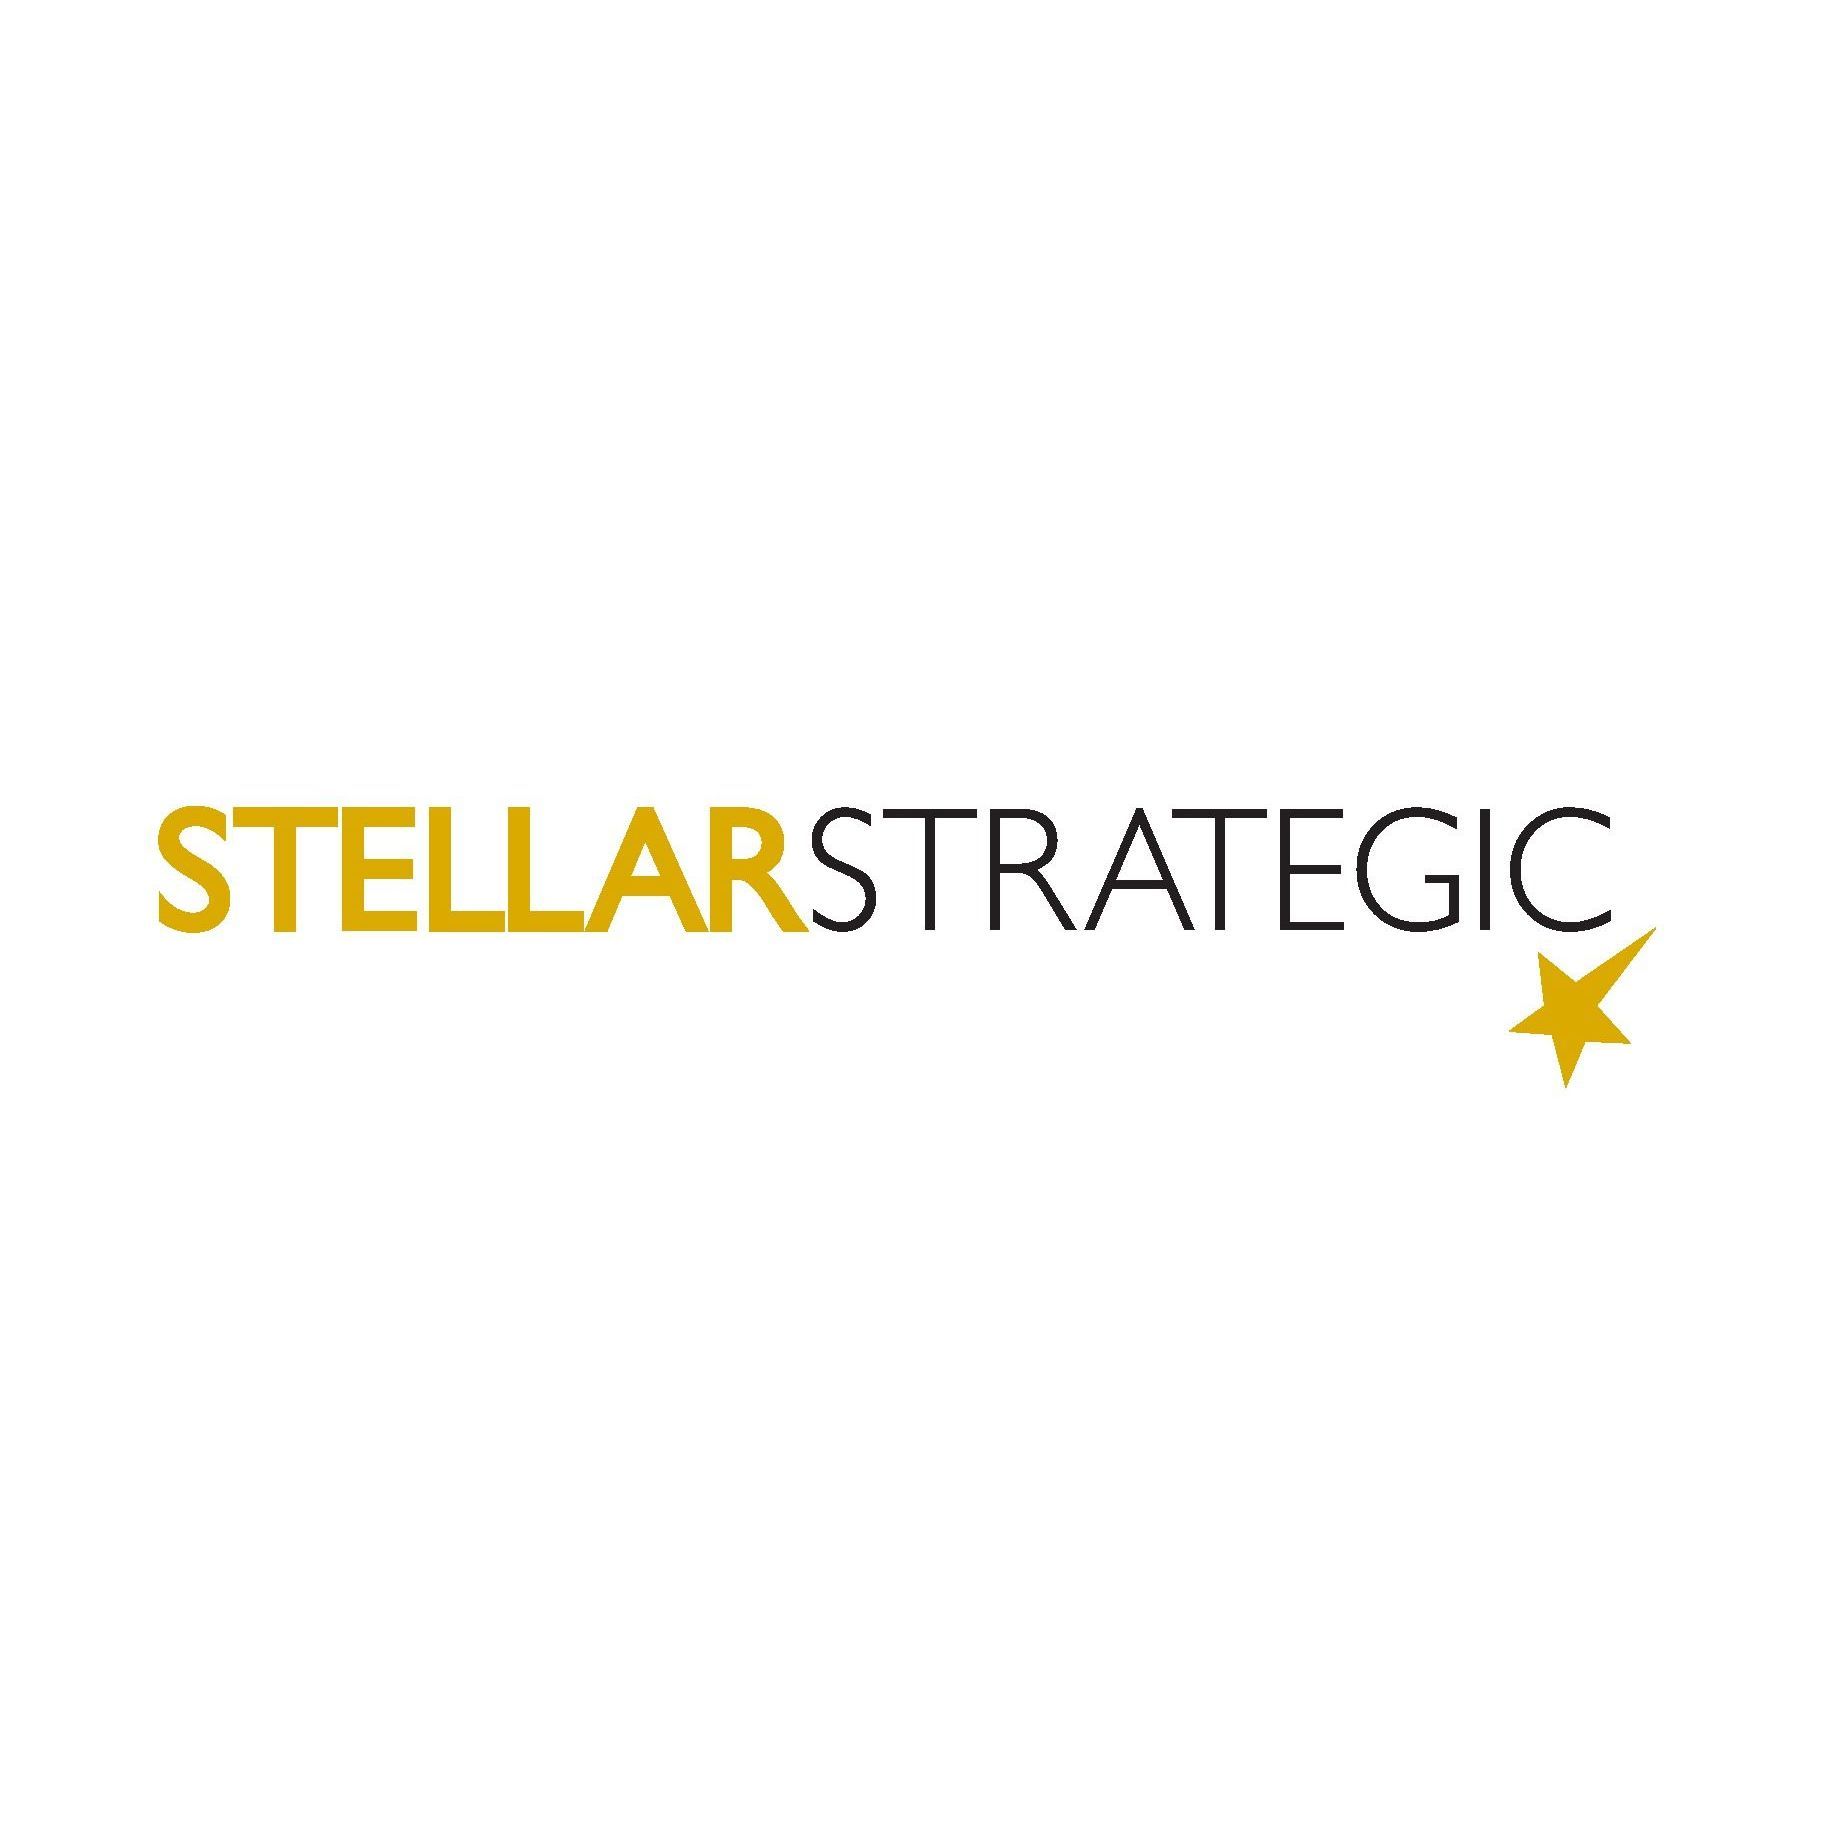 Stellar Strategic Group